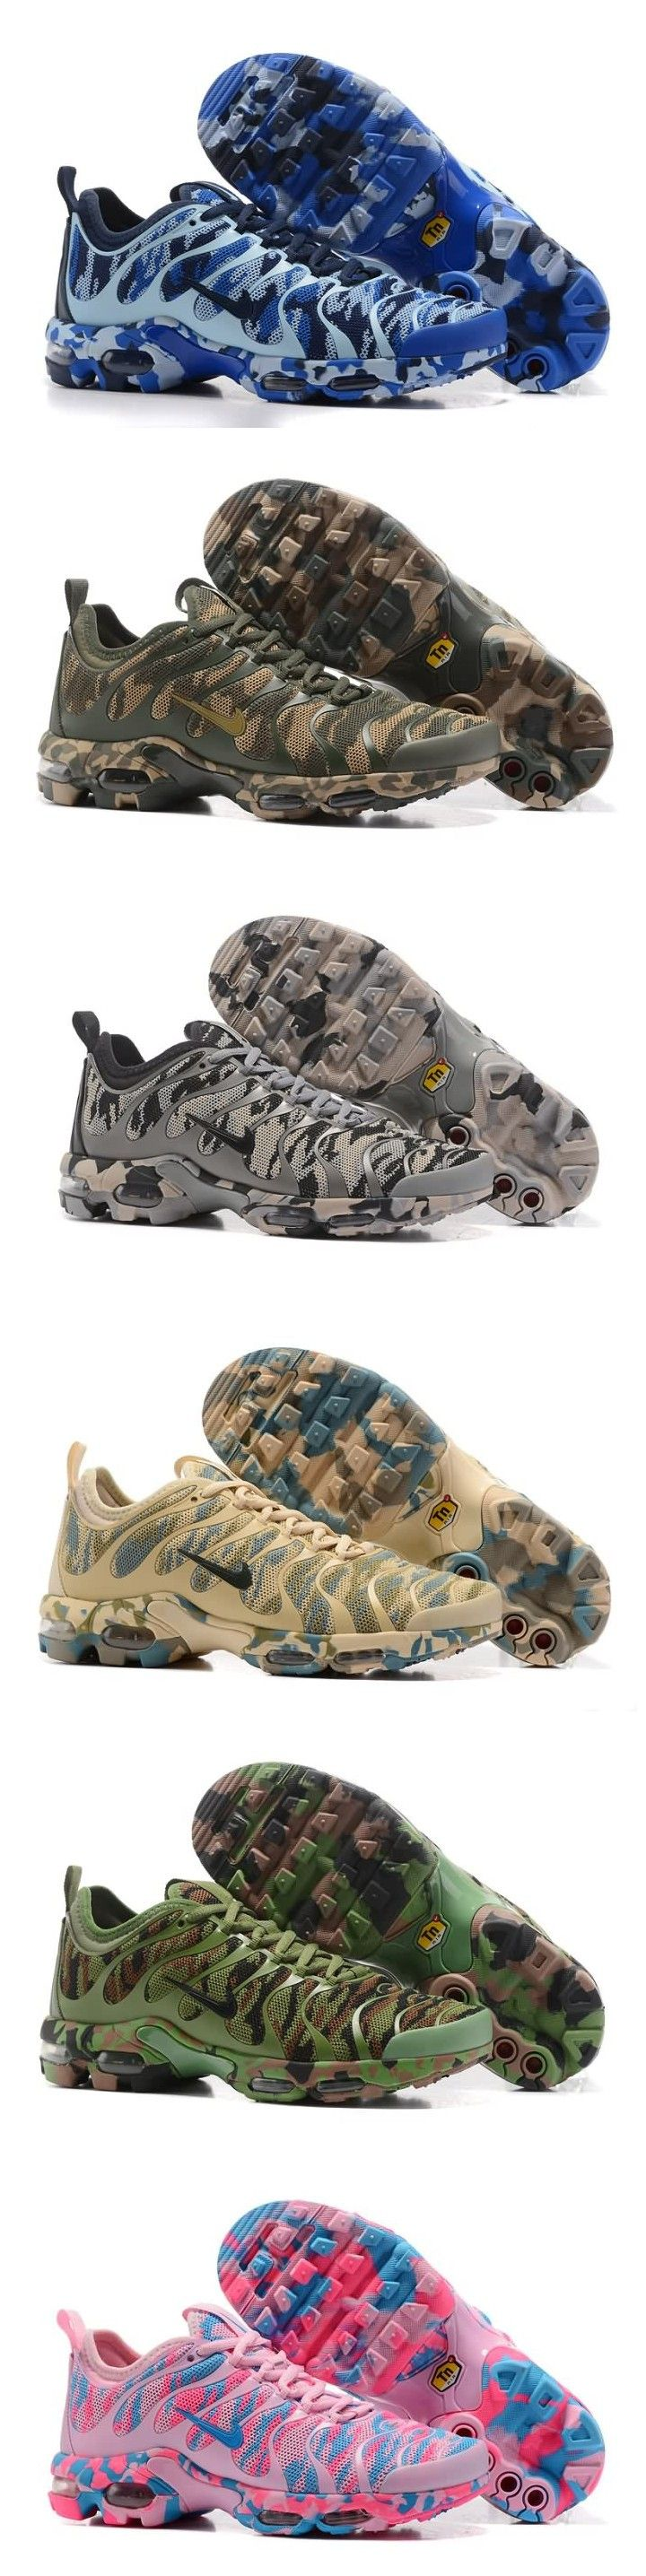 Nike Air Max Plus TN Ultra Camouflage Unisex shoes Free Shipping 36-46 WhatsApp:8613328373859